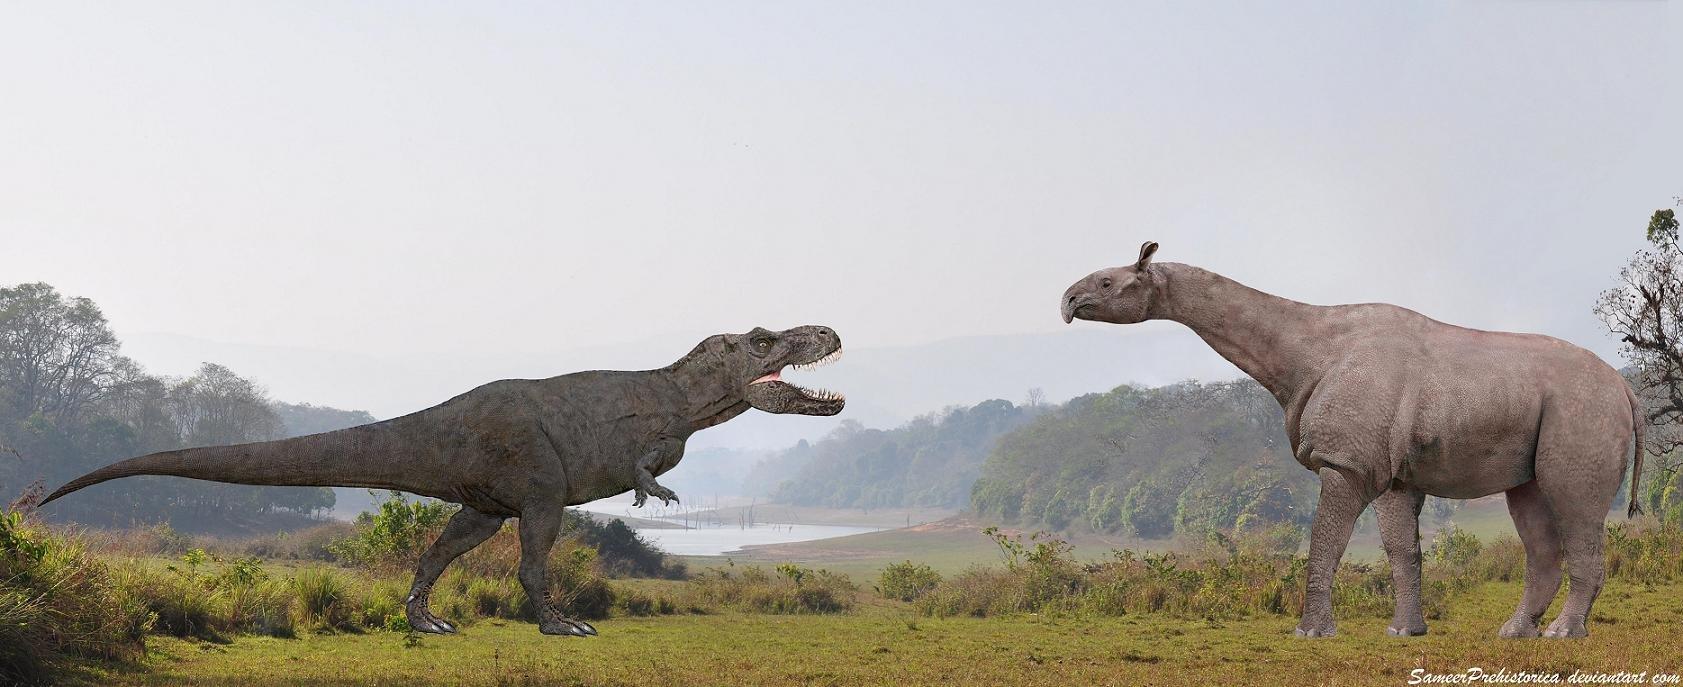 tyrannosaurus_rex_vs_paraceratherium_by_sameerprehistorica-d5p0aqb